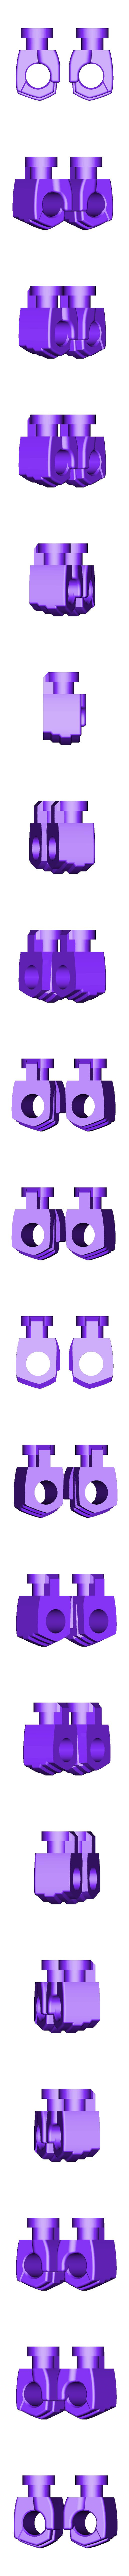 14_Brawn_Hand4_Fist_GREY.stl Download free STL file G1 Transformers Brawn • 3D printer object, Toymakr3D